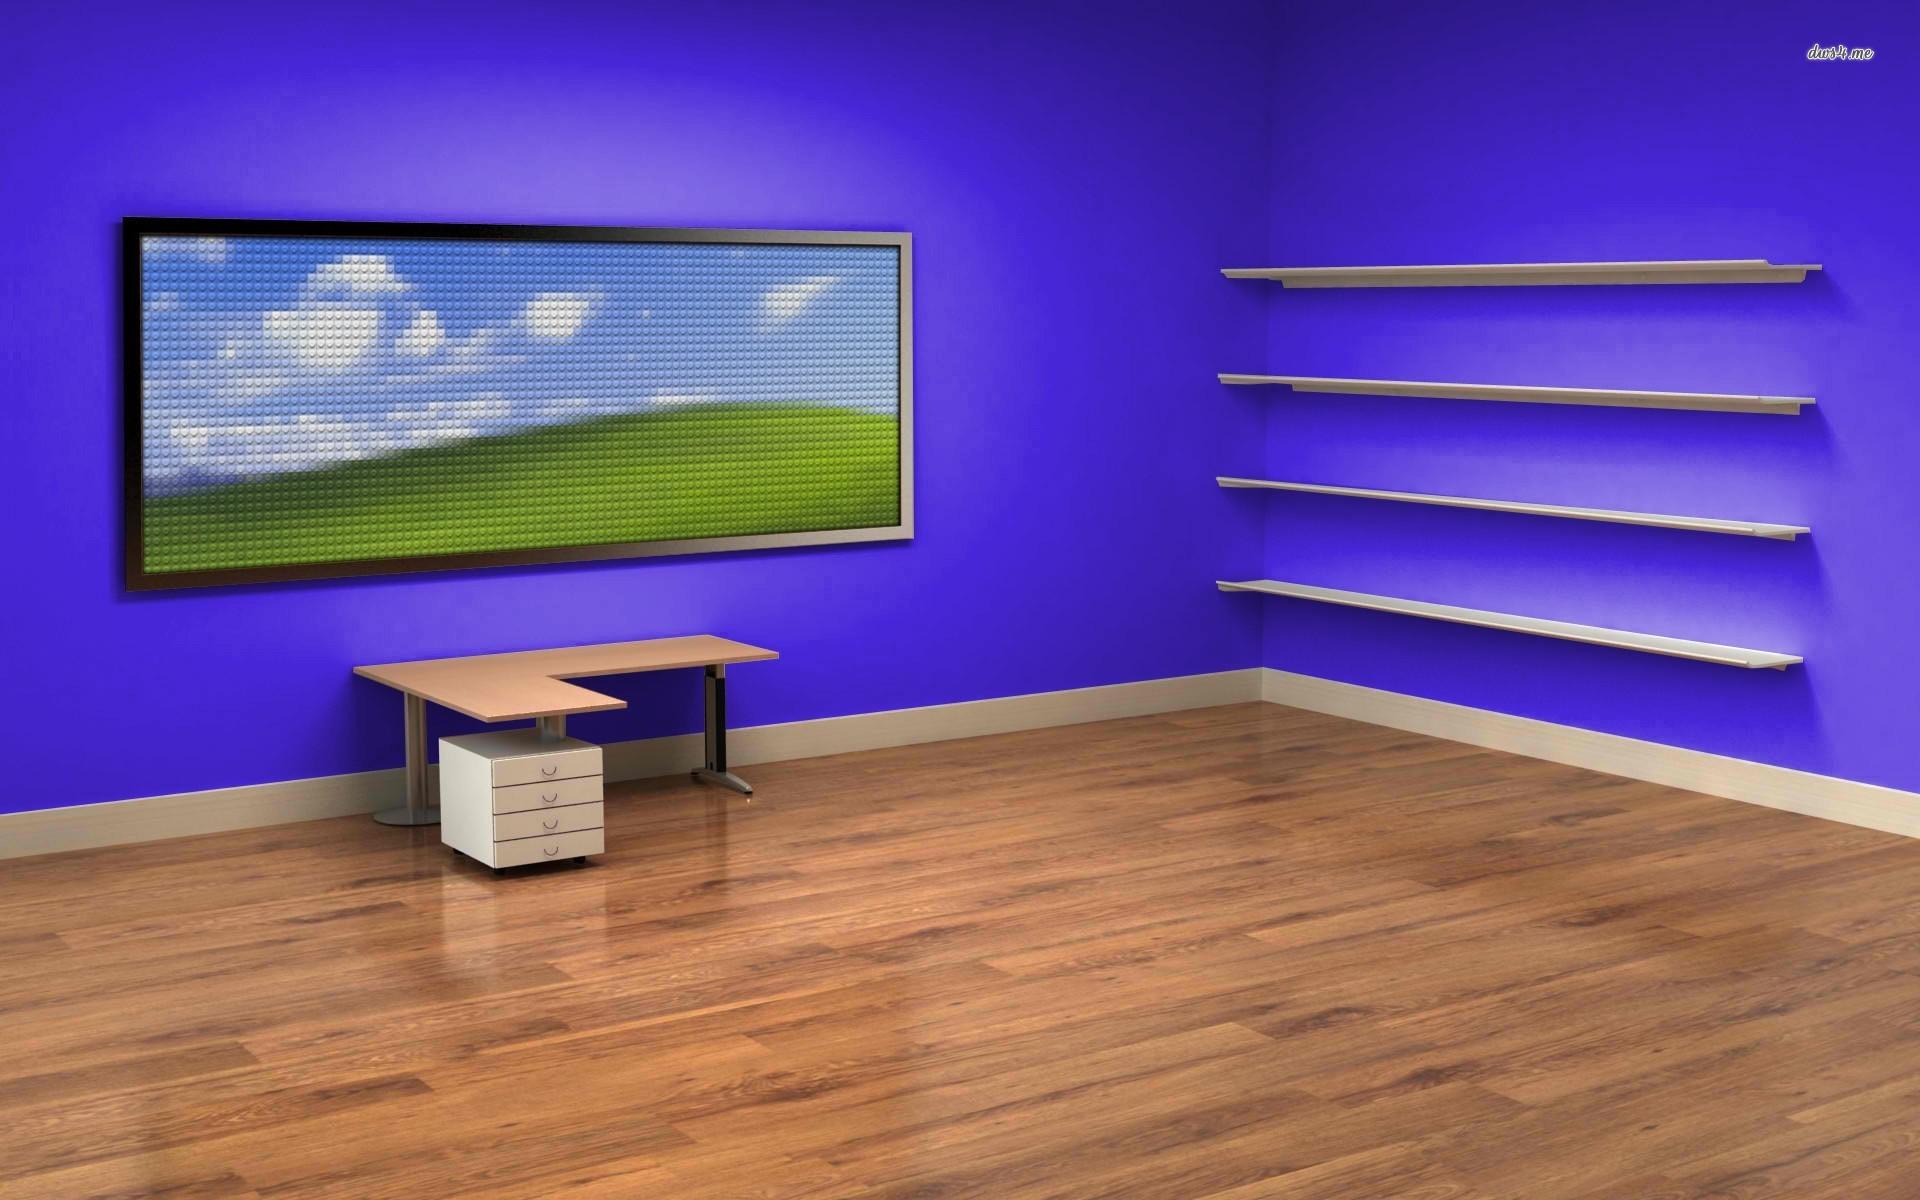 Empty office wallpaper - Digital Art wallpapers - #20826